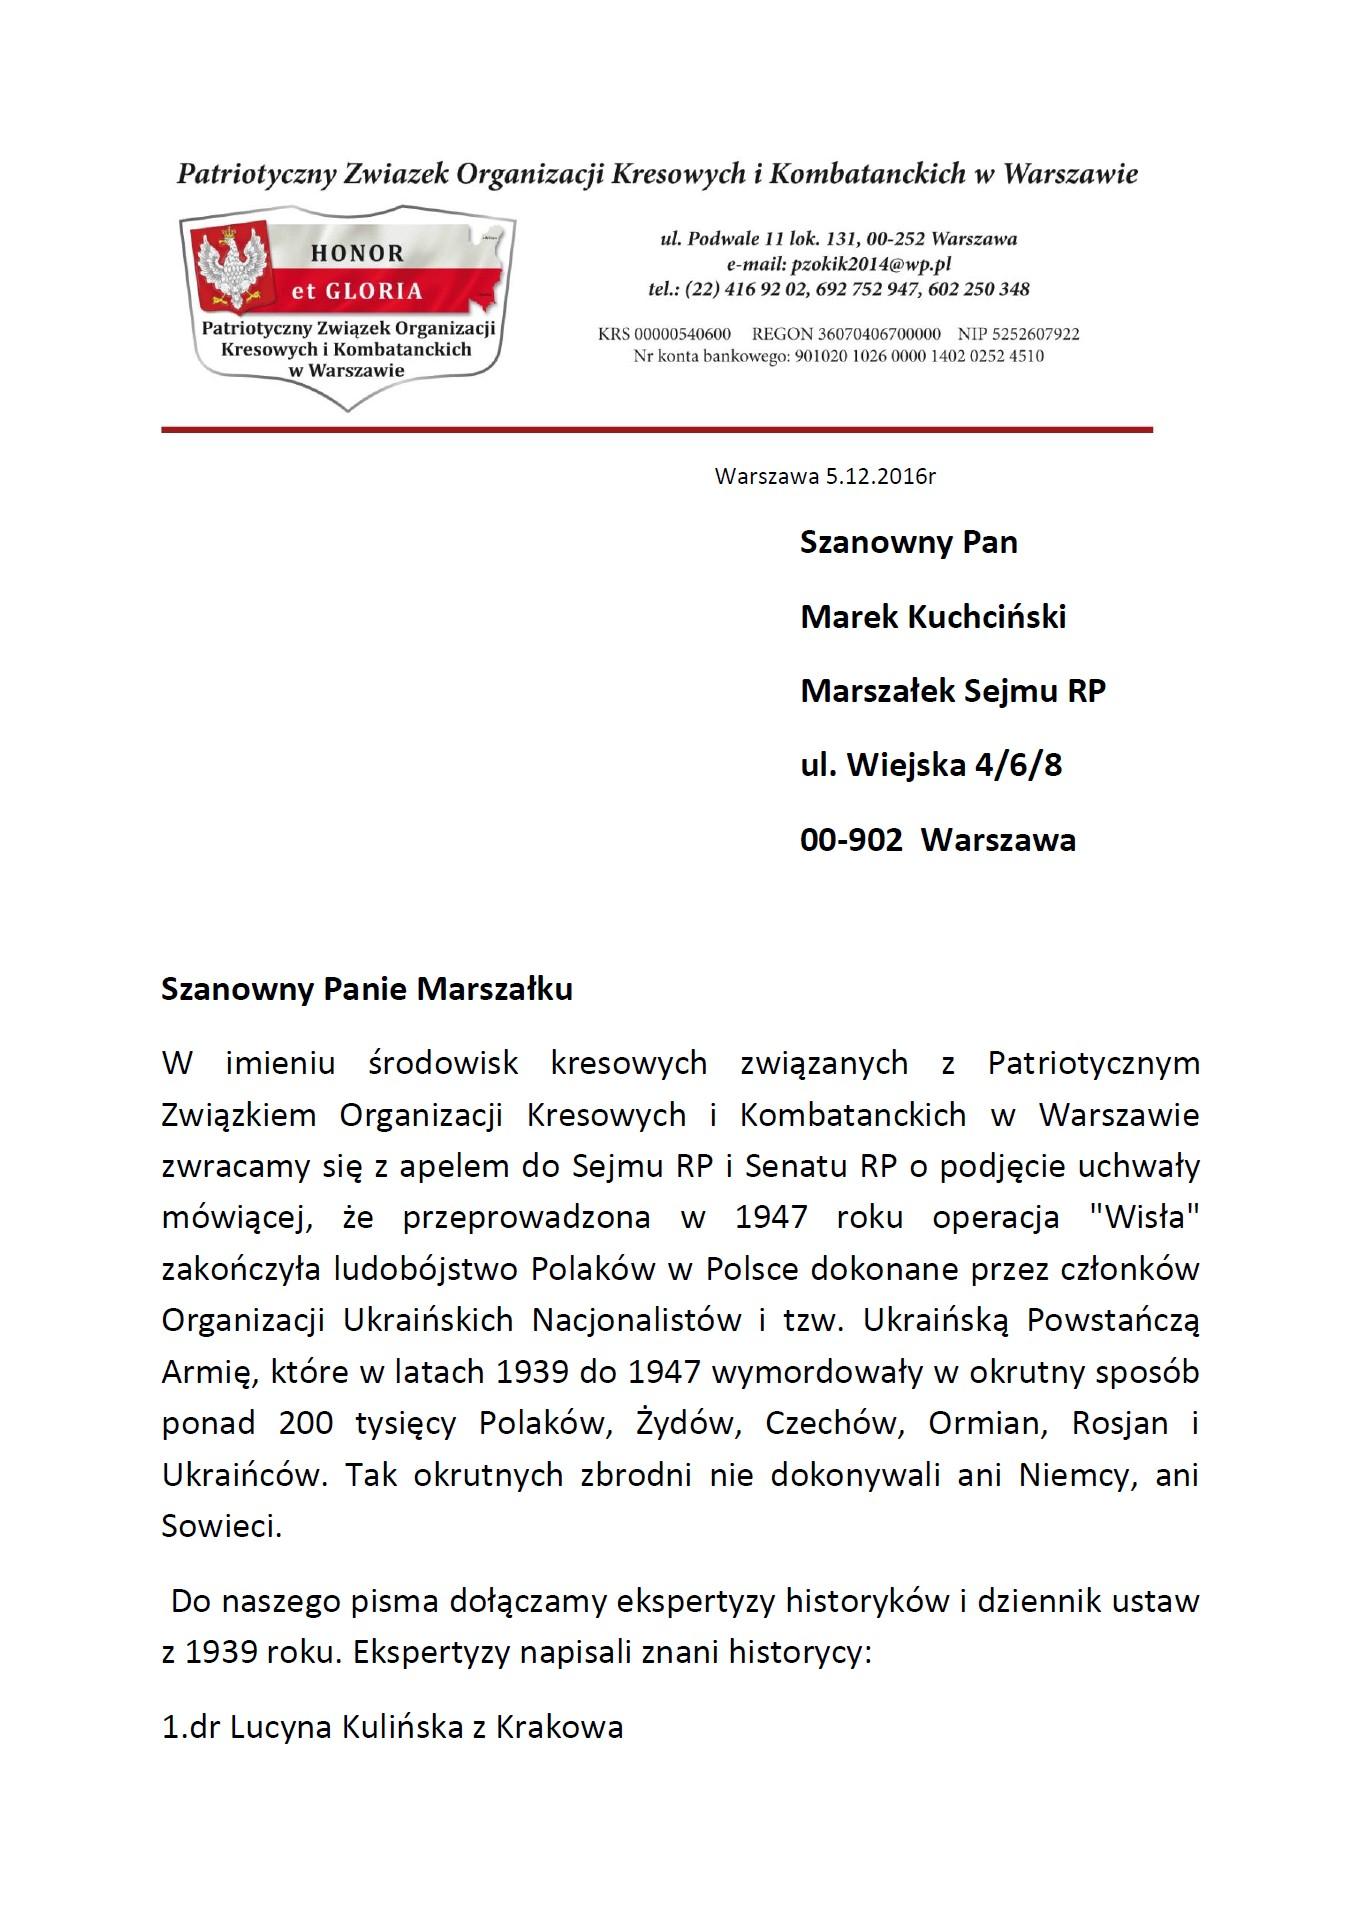 list_do_marszalka_sejmu_20161205_1